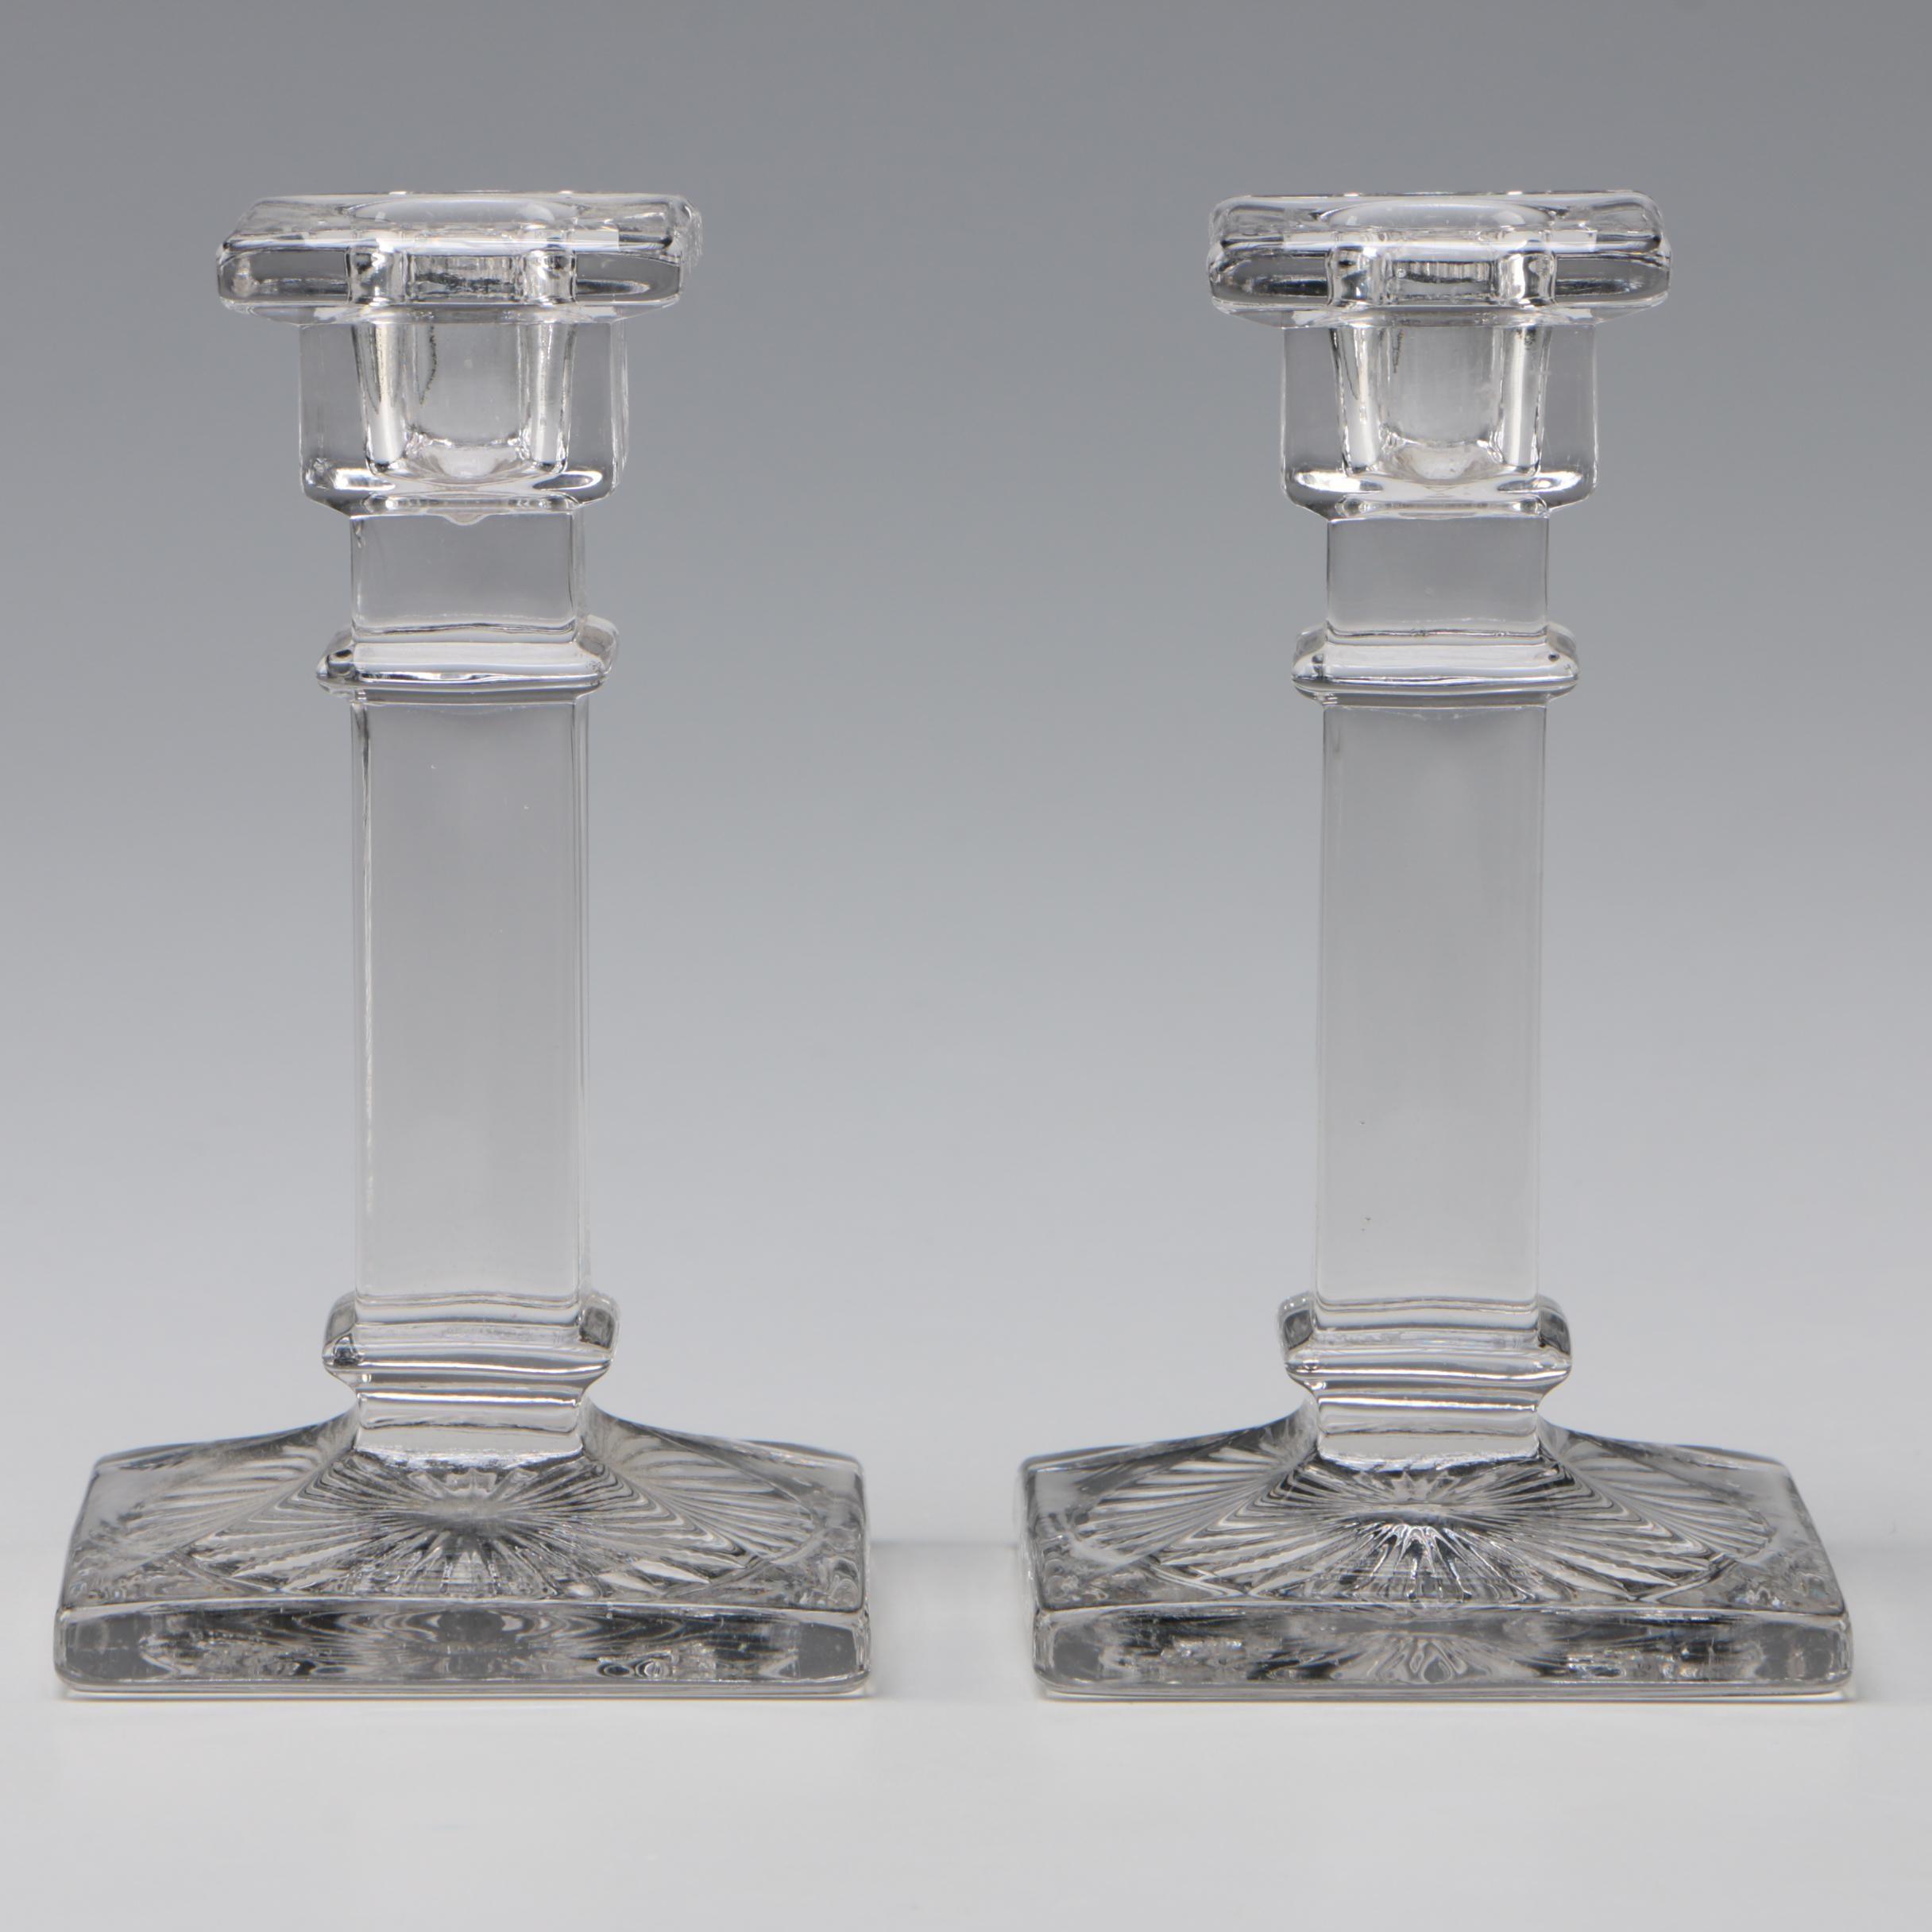 Pair of Pressed Glass Columnar Candlesticks